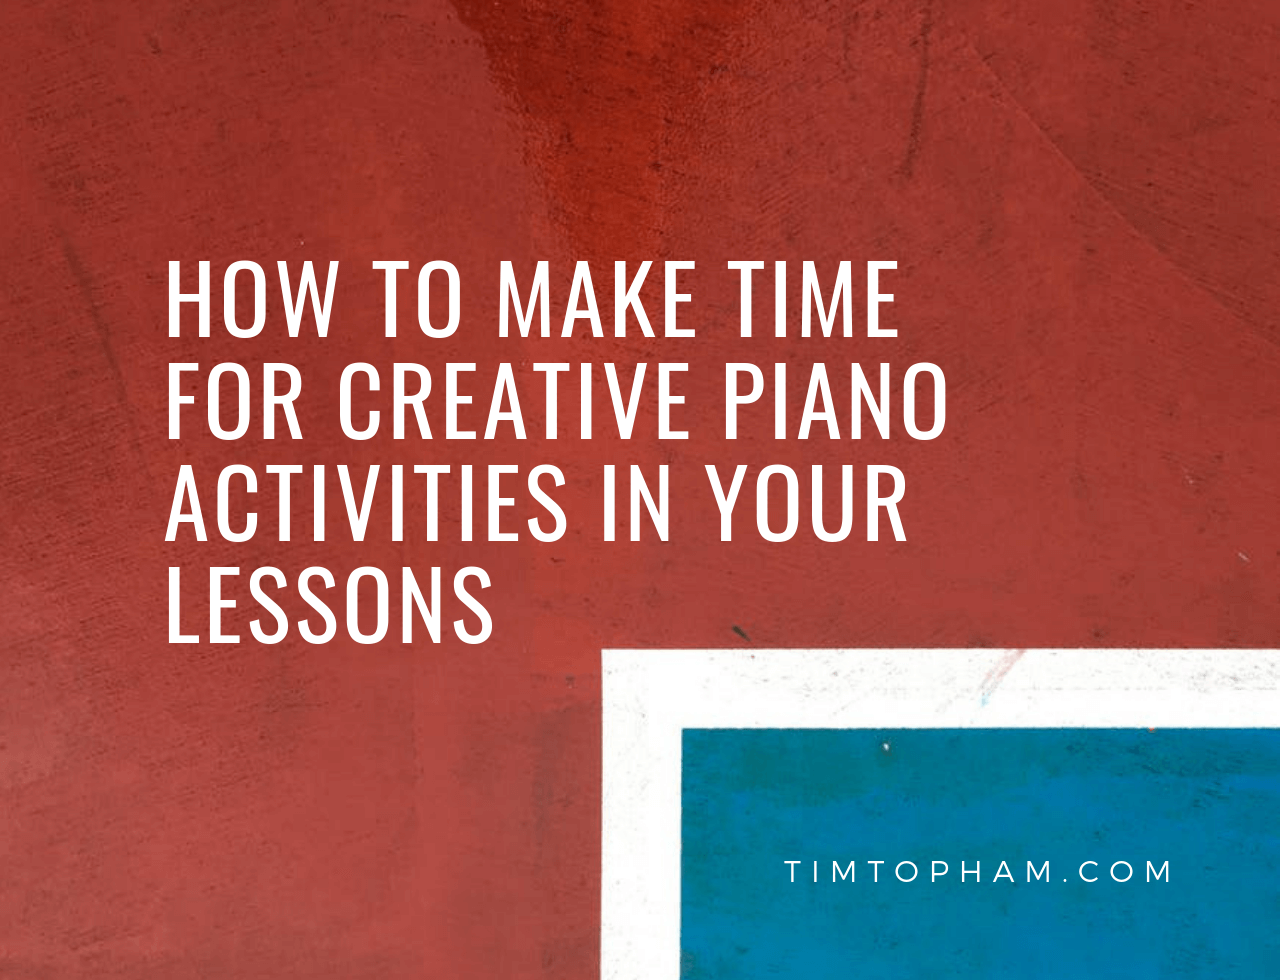 creative piano activities